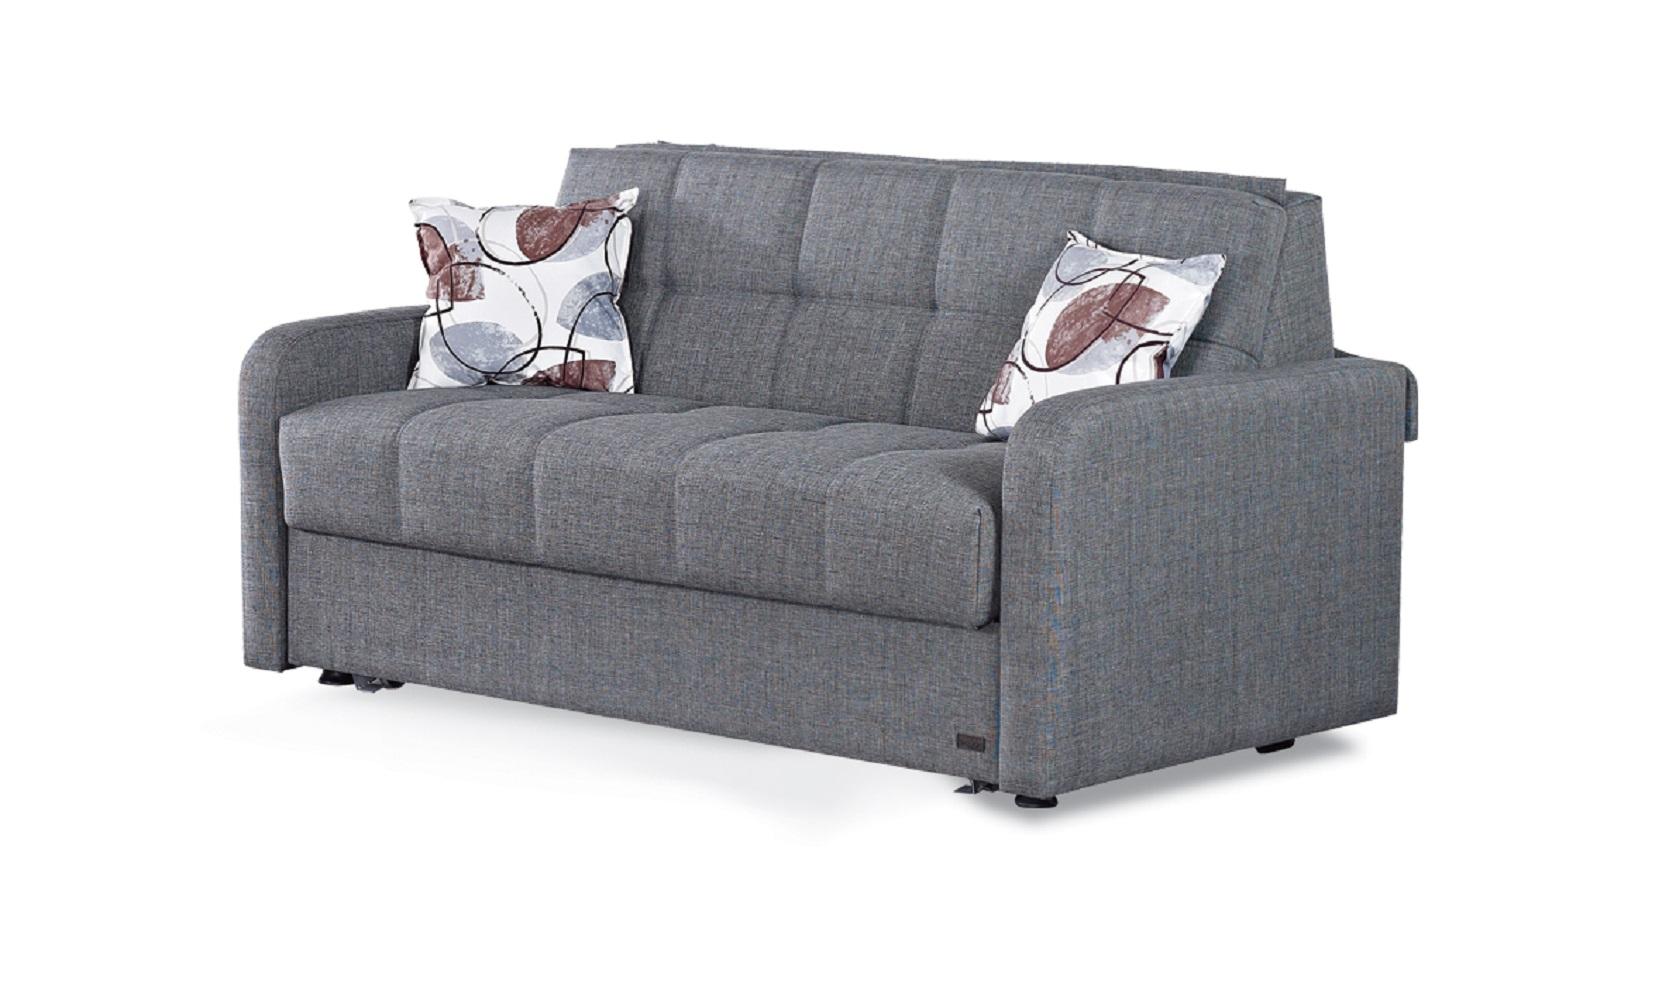 Stella Sofa Bed By Empire Furniture Usa